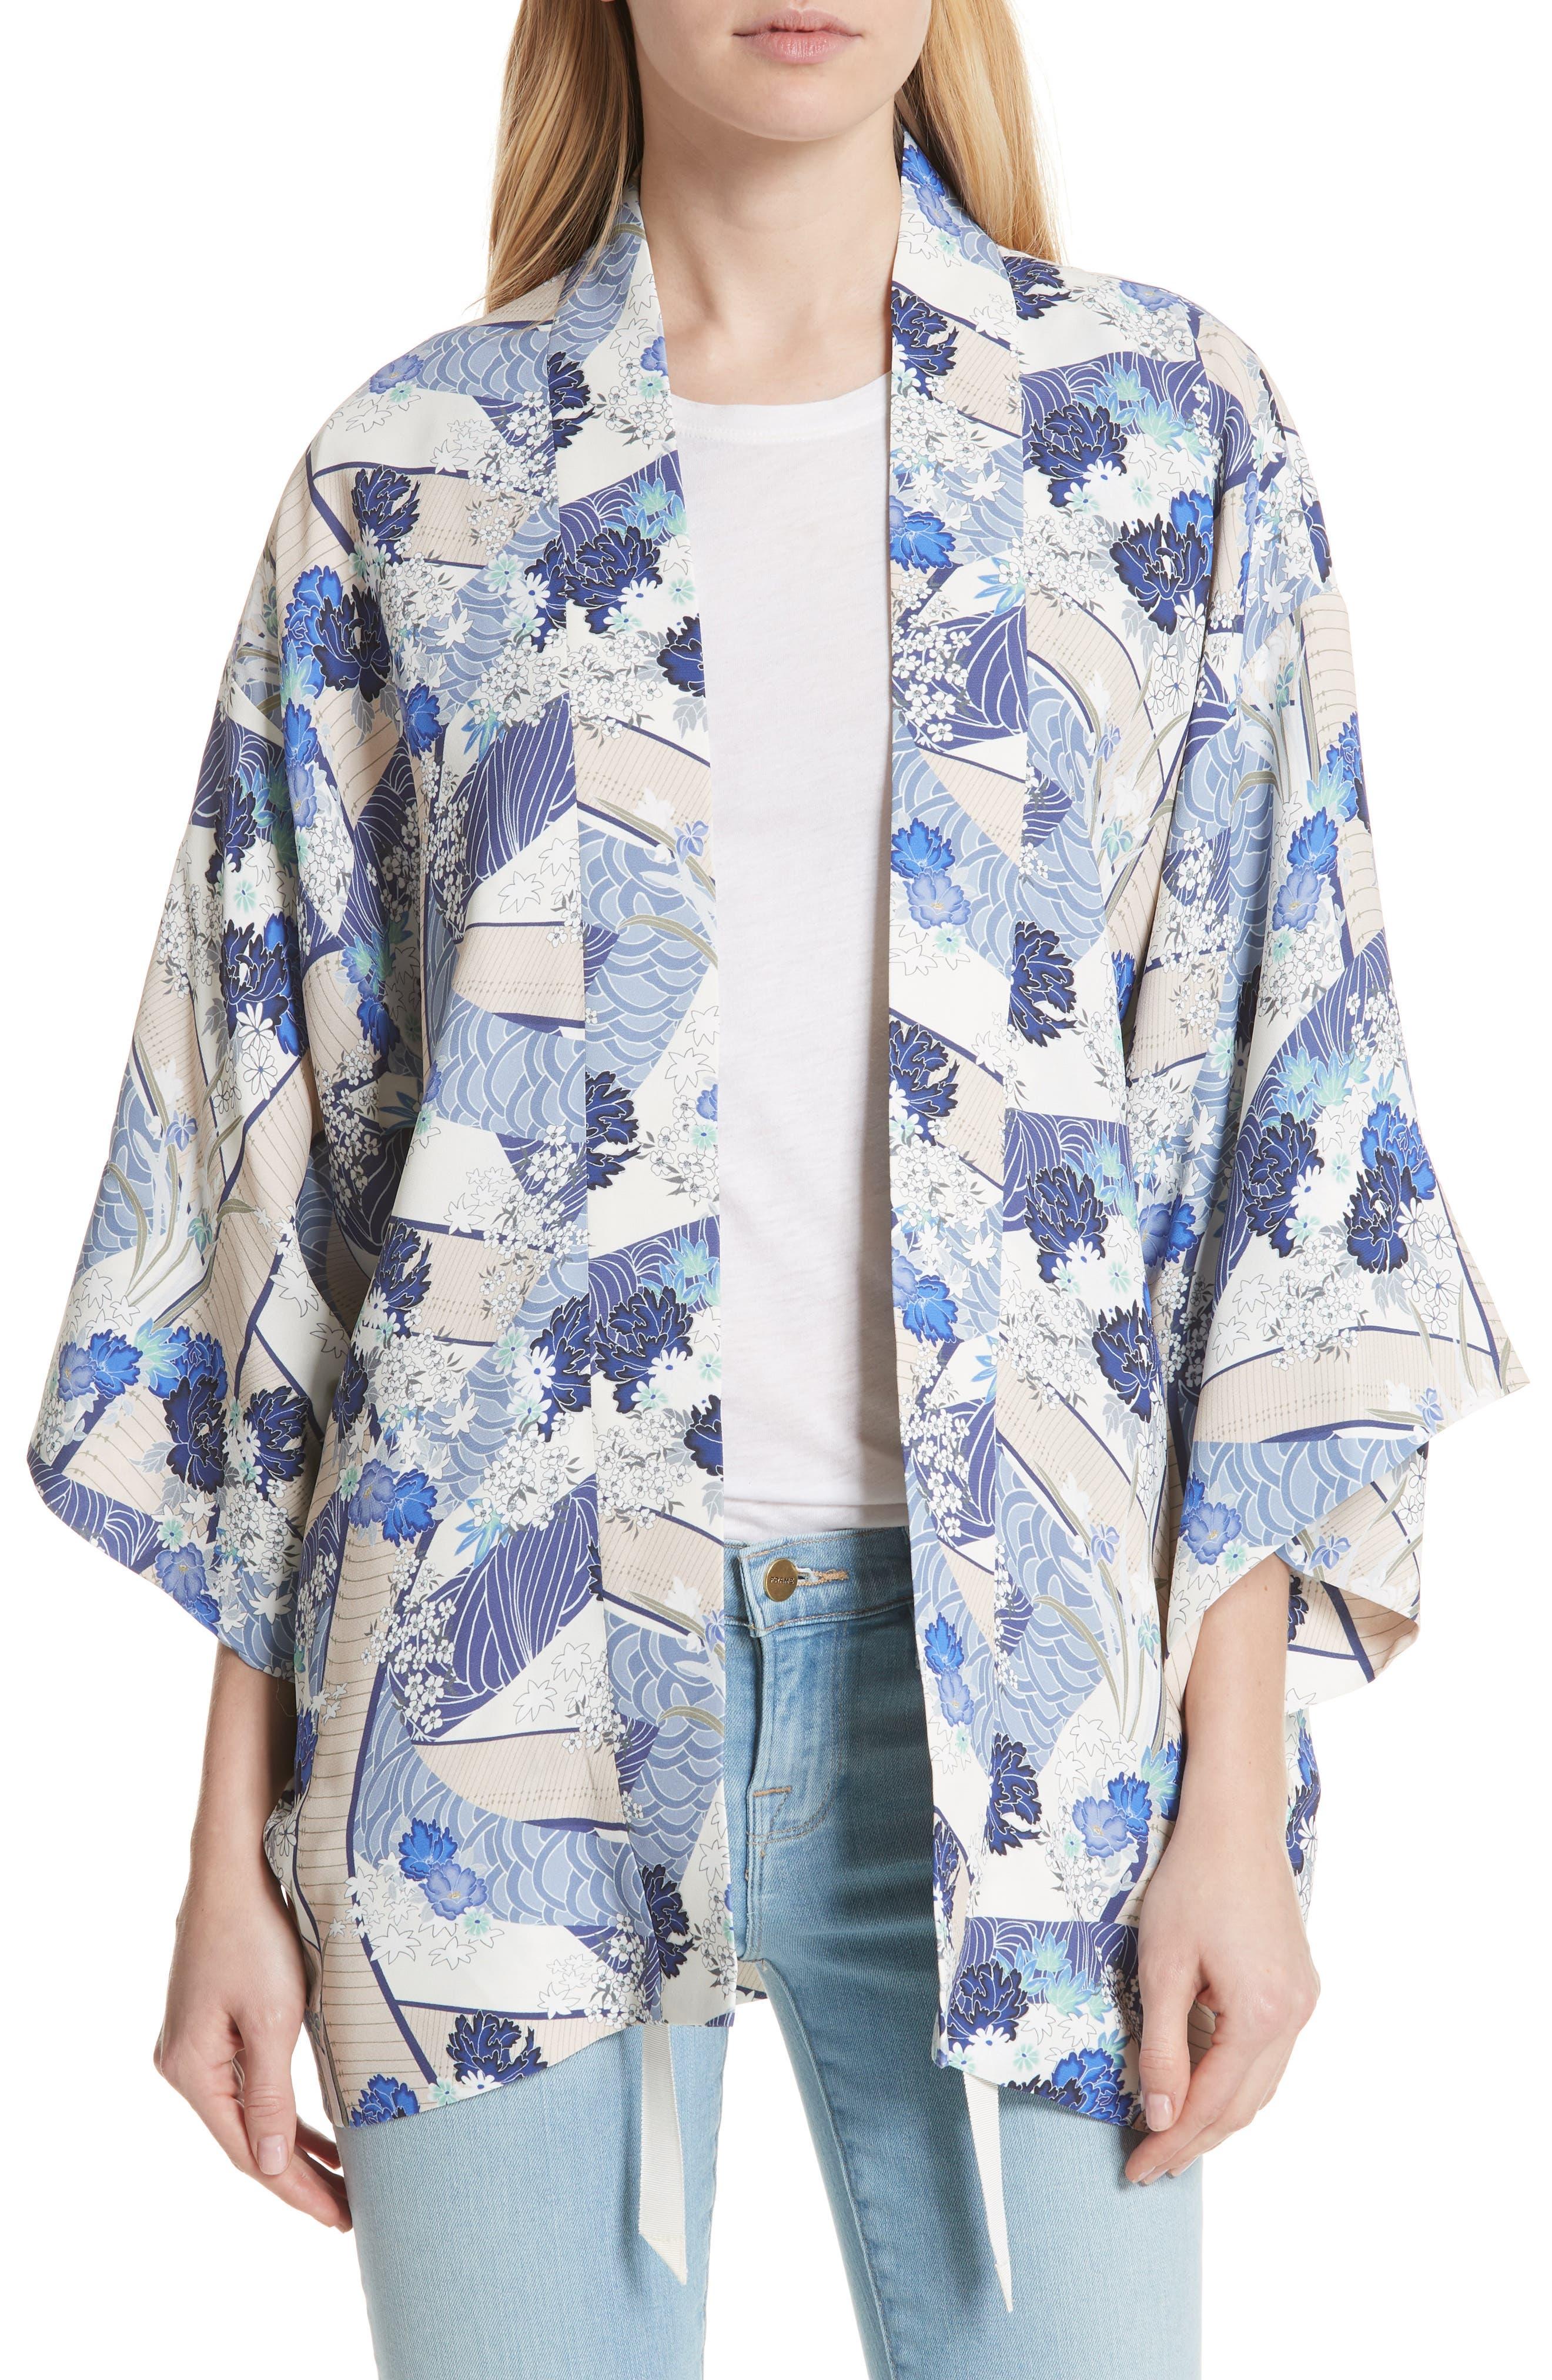 Alternate Image 1 Selected - Elizabeth and James Drew Floral Print Kimono Jacket